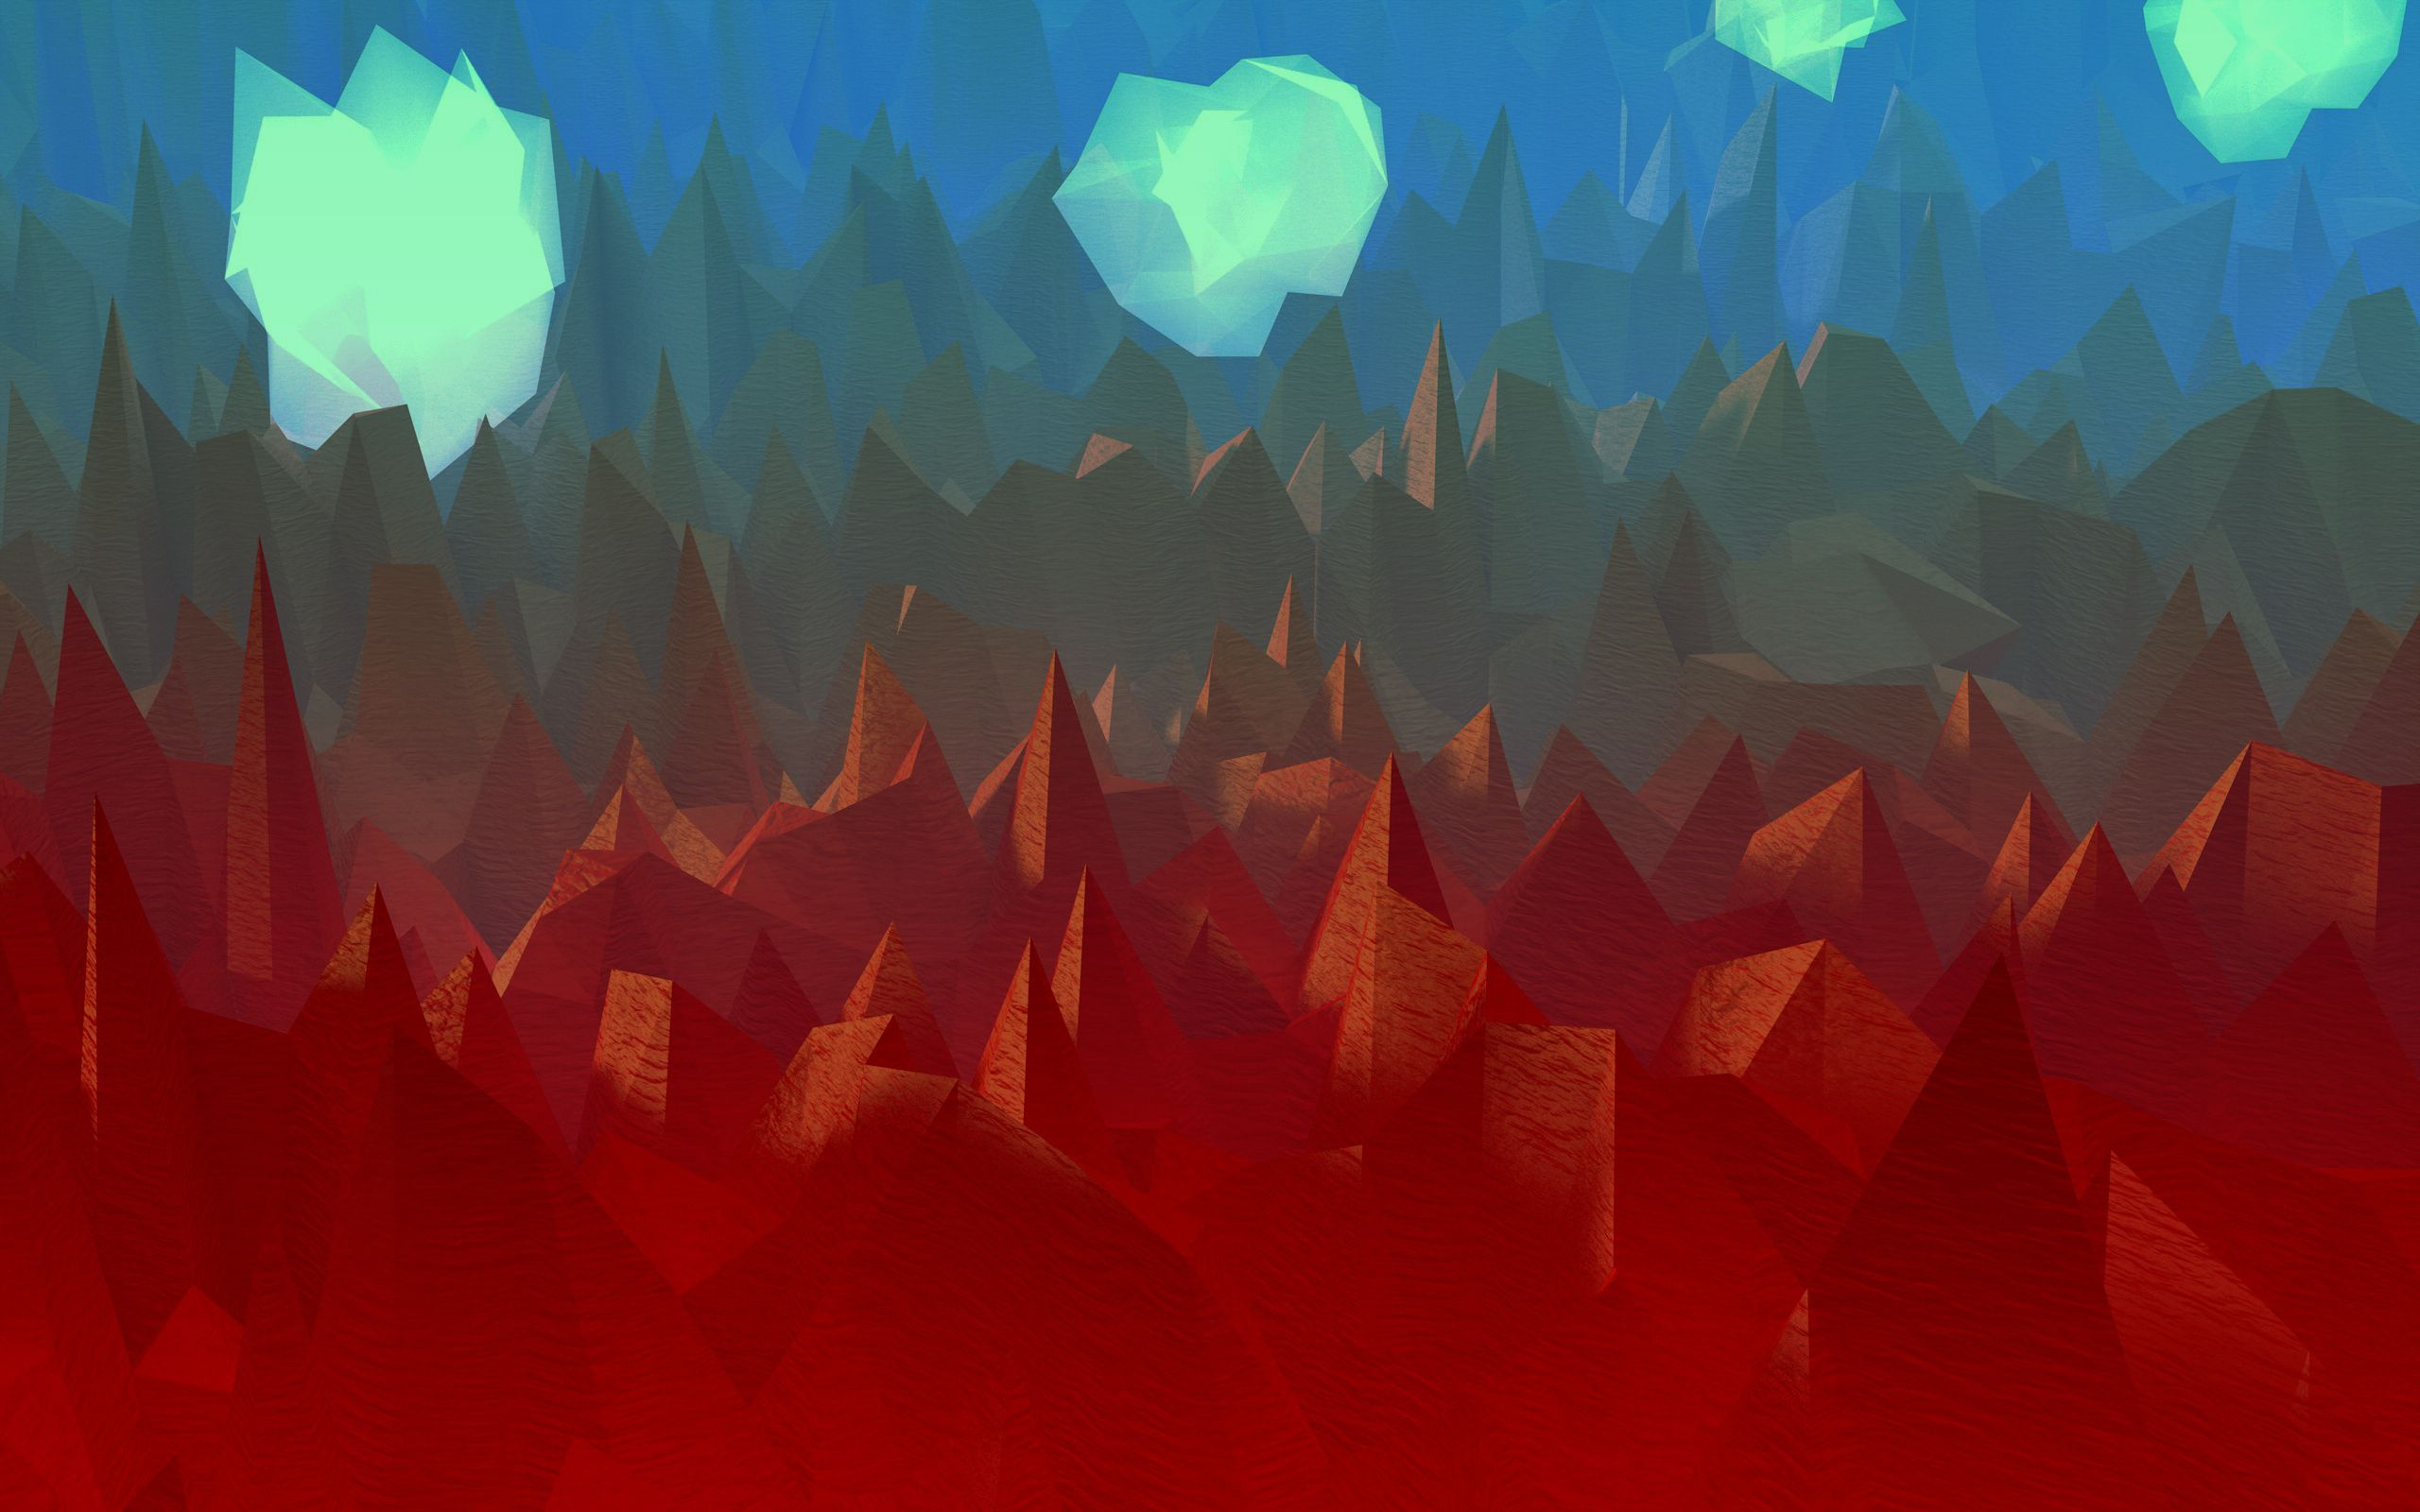 Polygon art abstract wallpaper 2560x1600 79407 wallpaperup voltagebd Choice Image